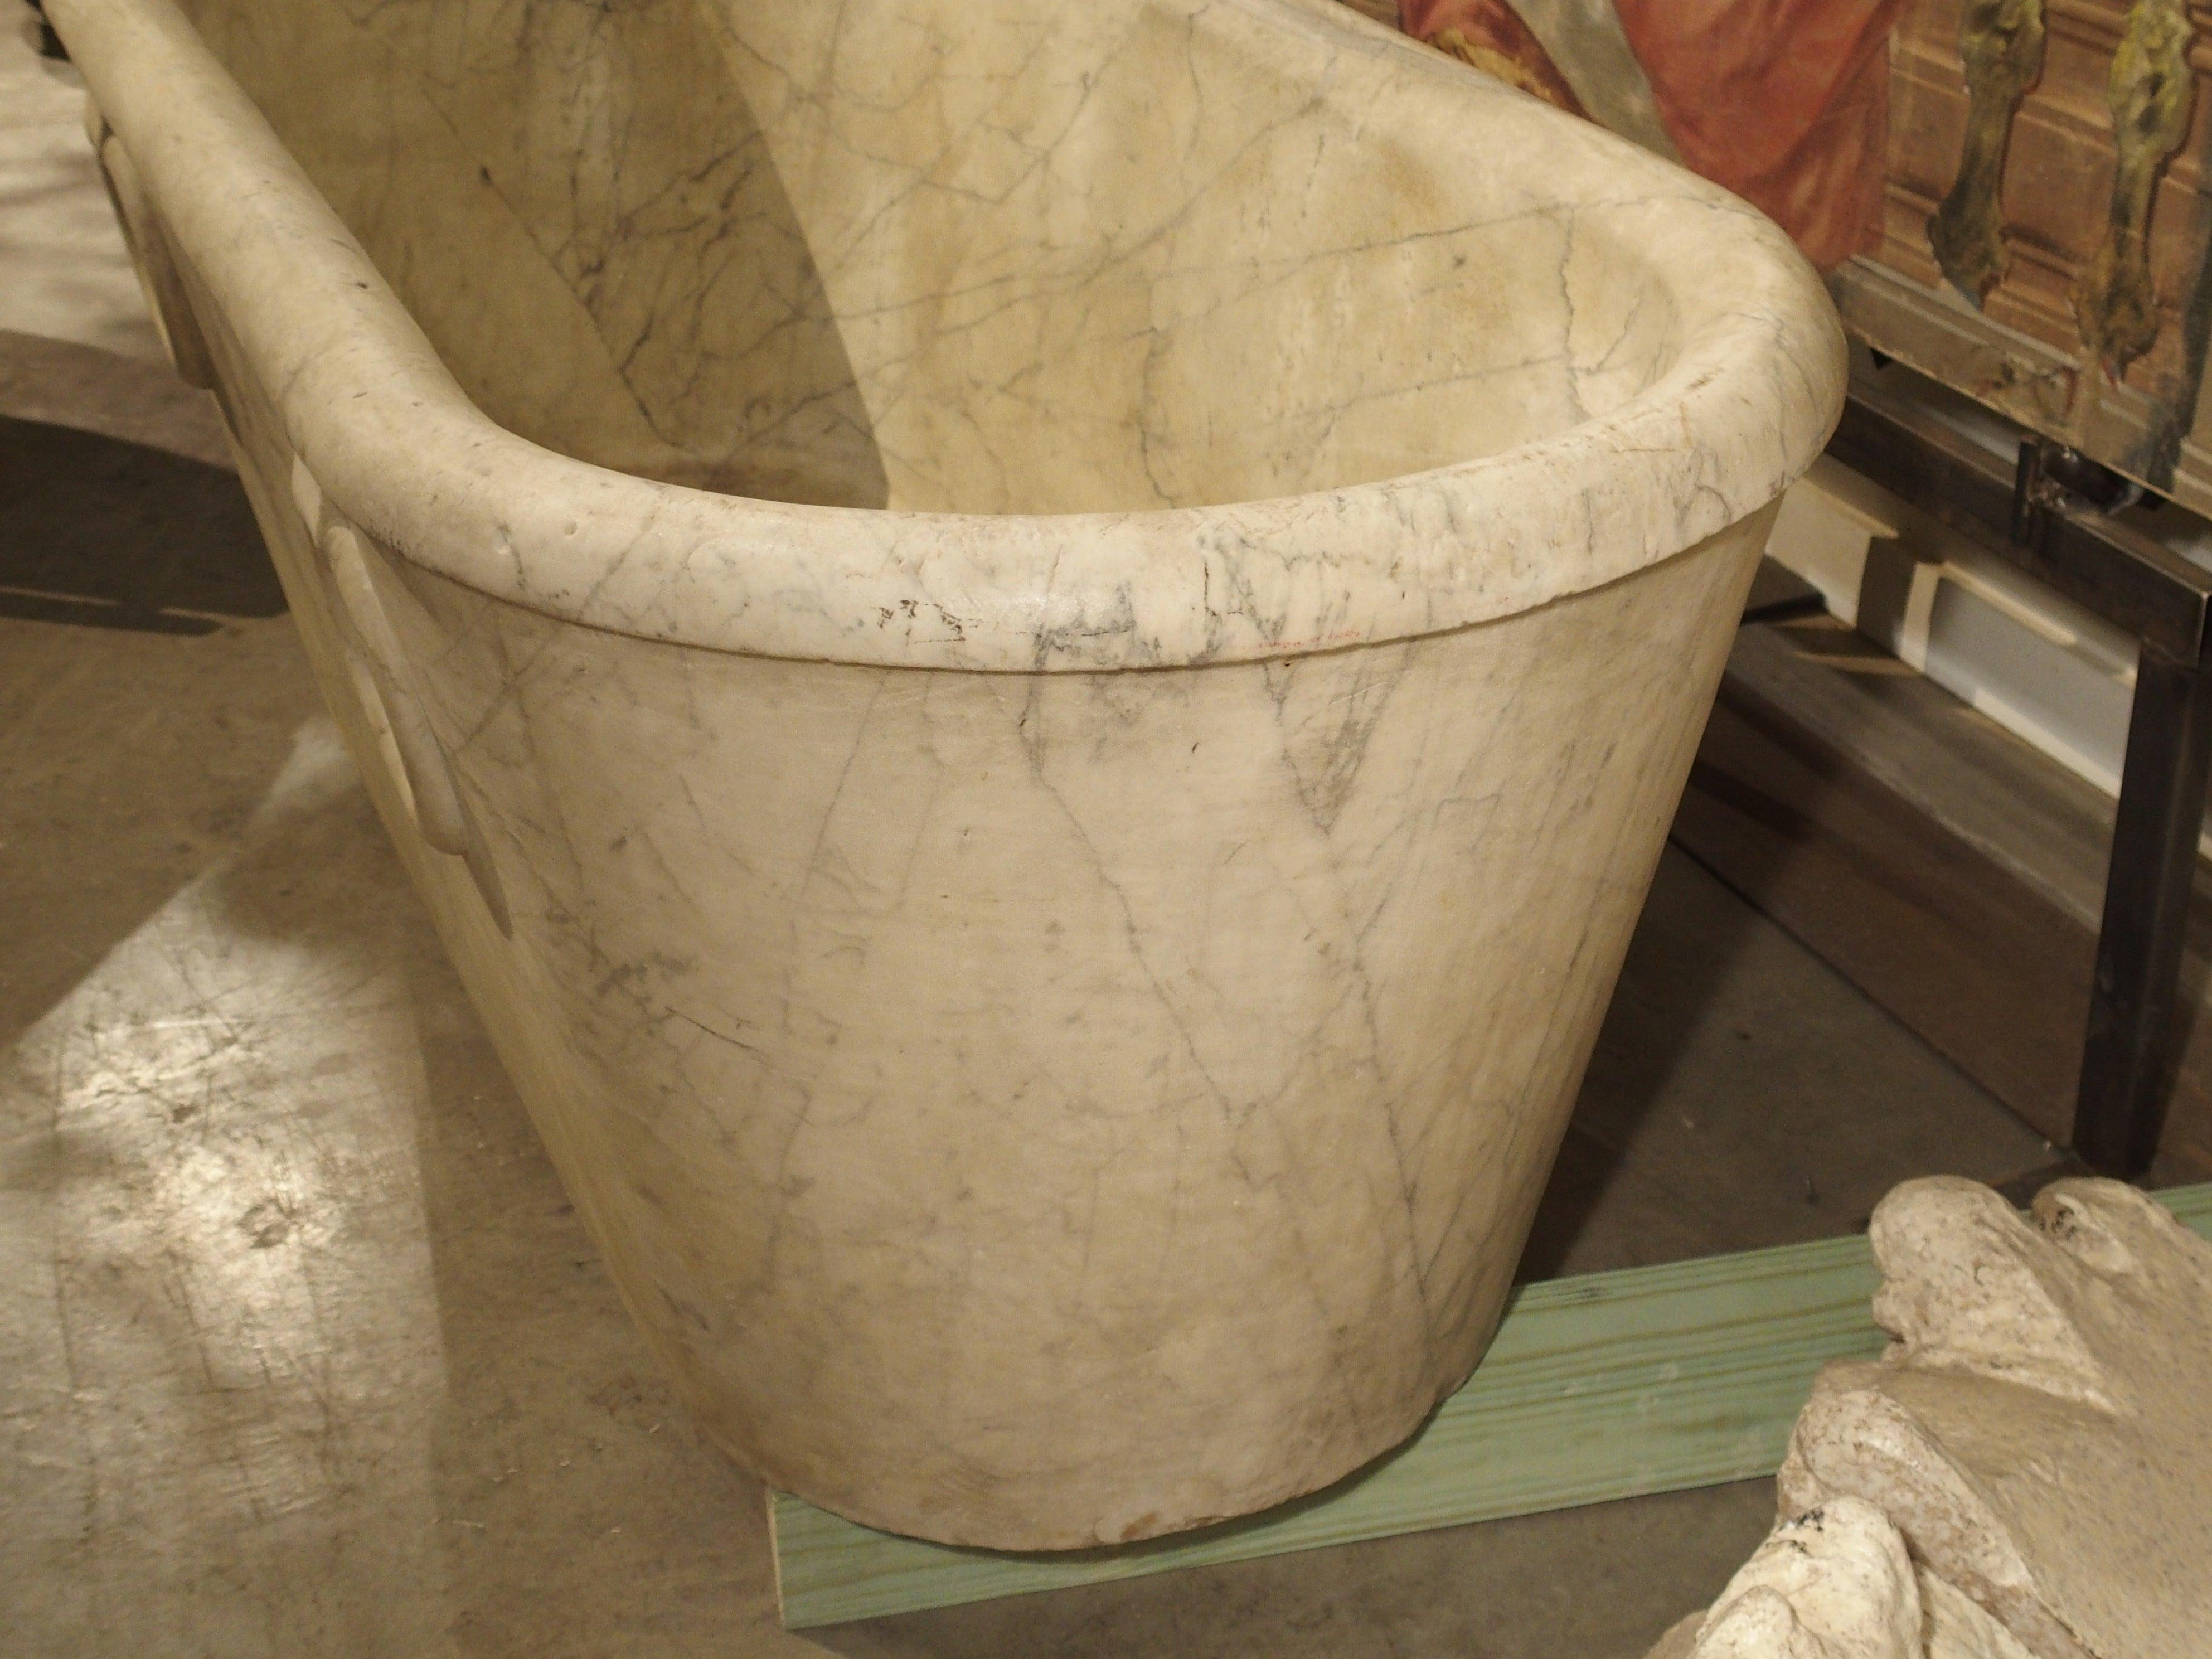 Antique Carrara Marble Bathtub from Italy, Early 1800s Genoa at 1stdibs